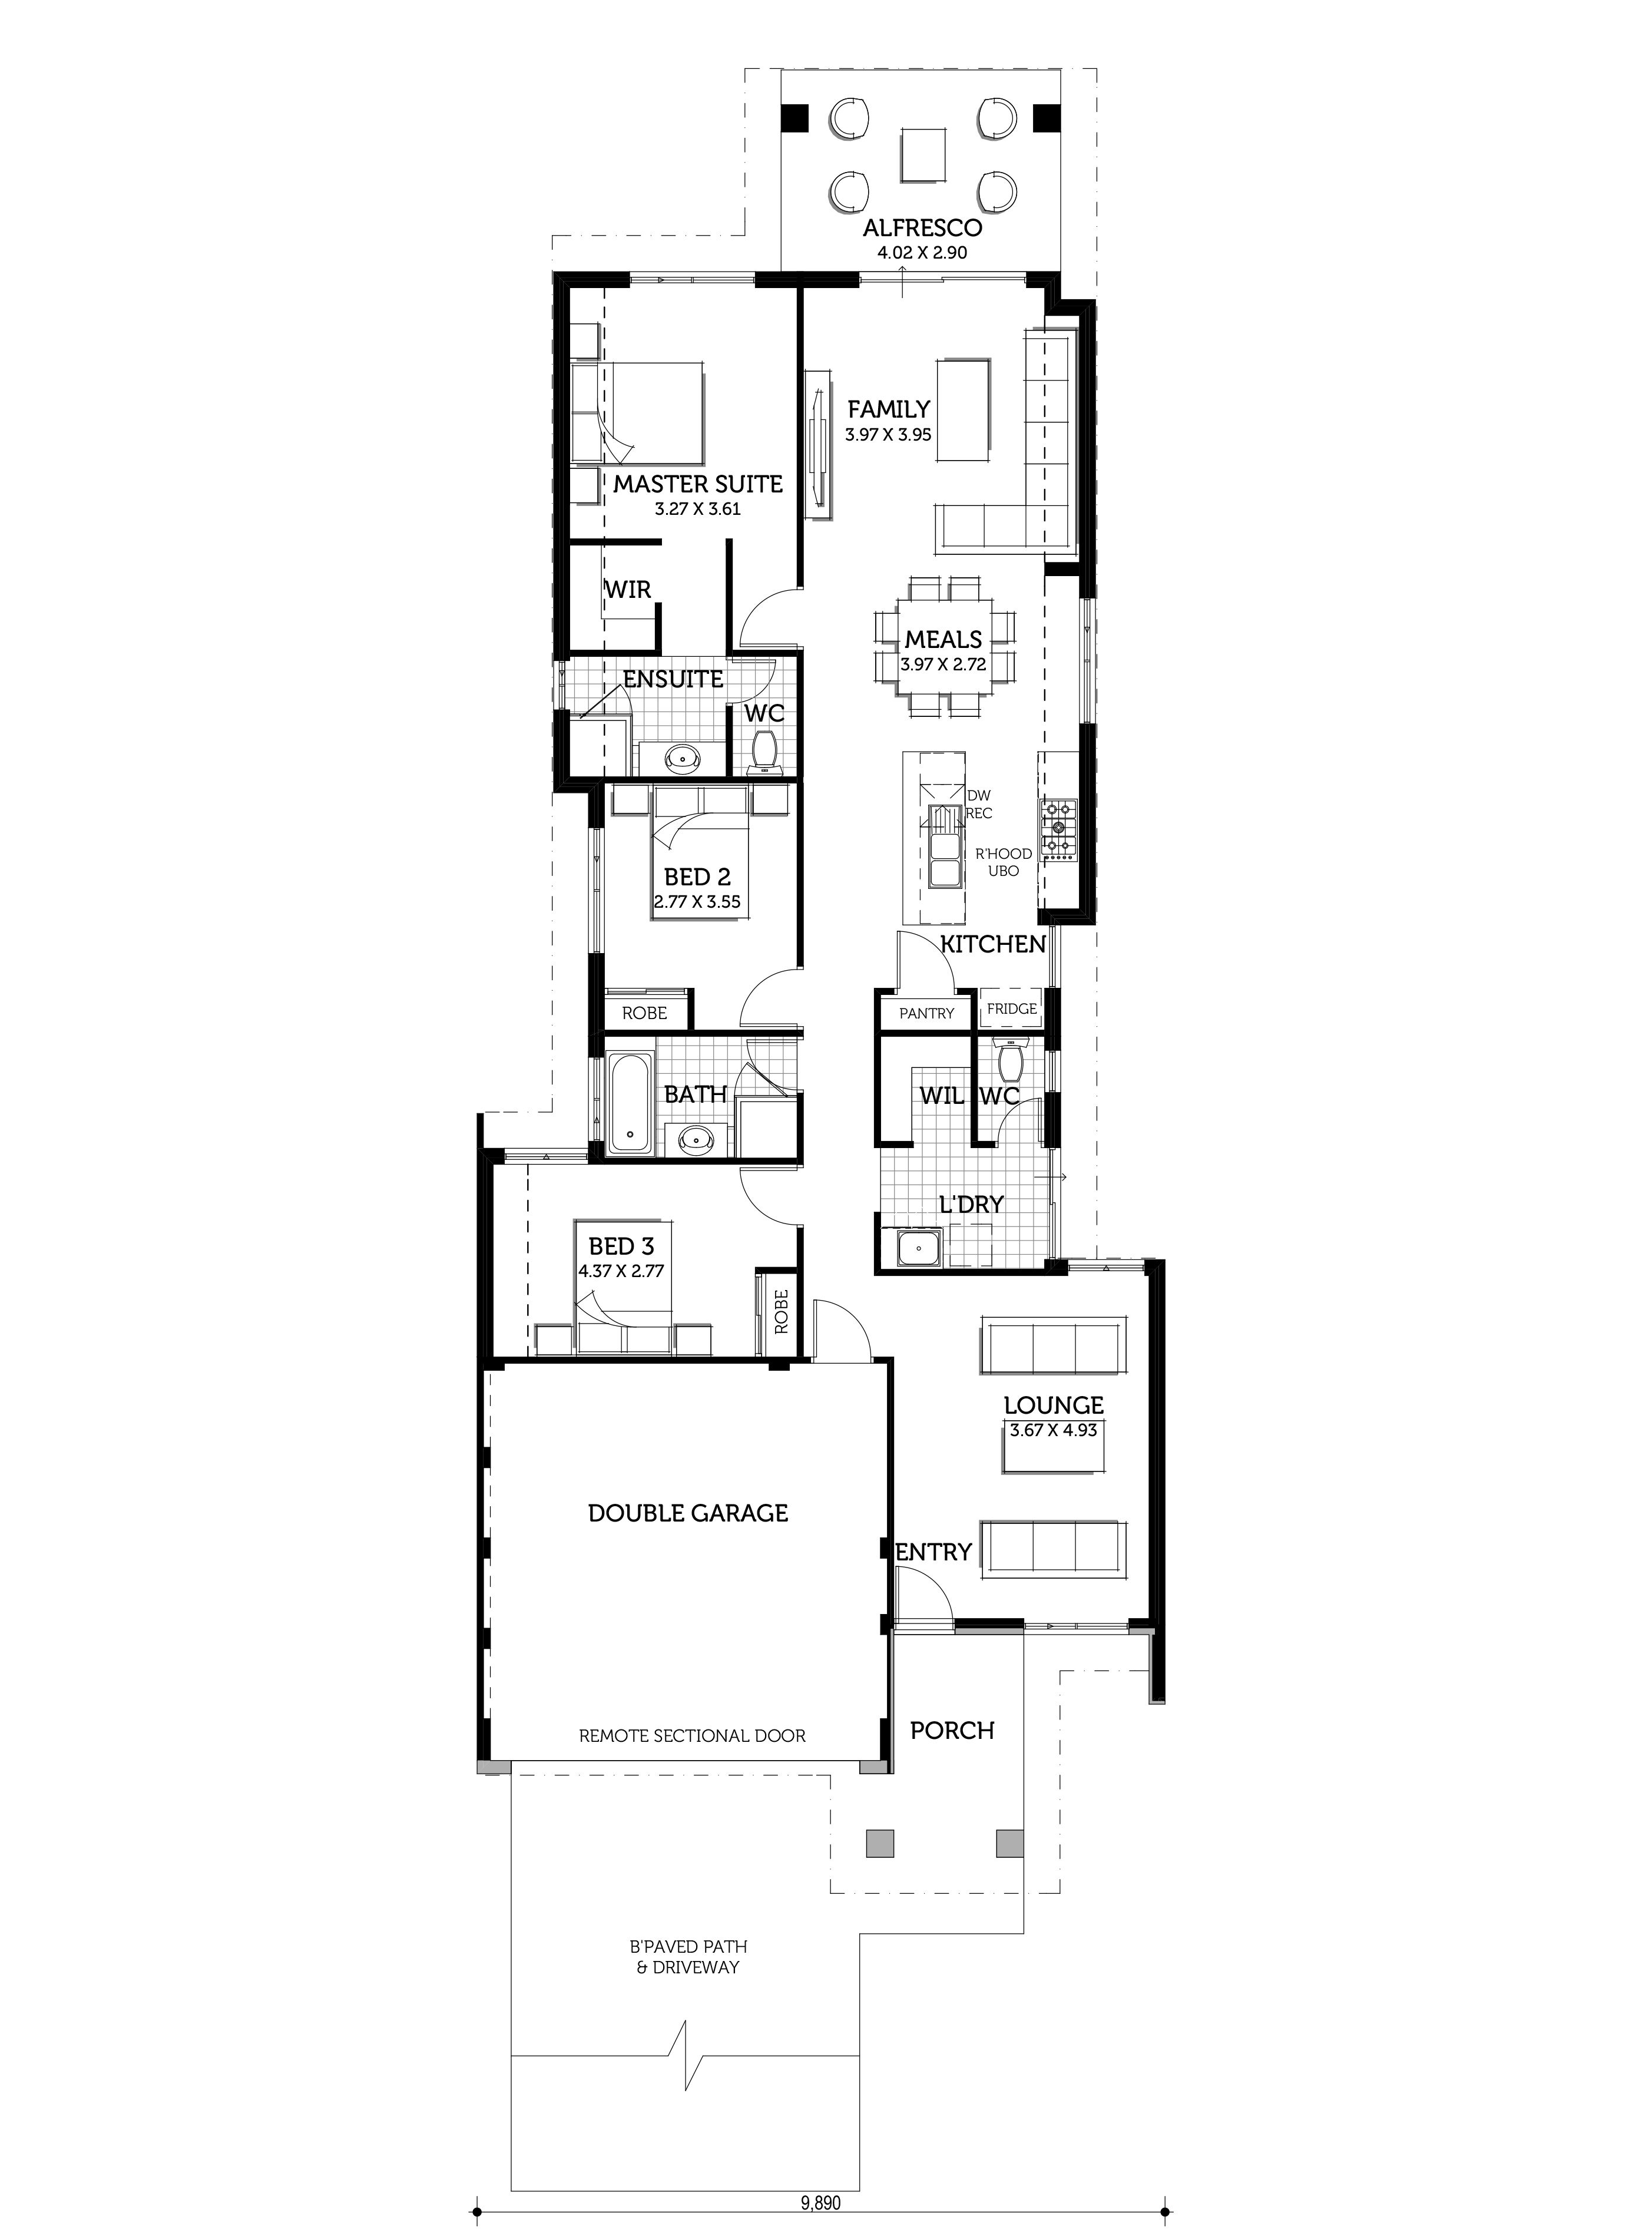 The Distinction Home Design Smart Homes For Living House Design Simple House Design Narrow House Plans